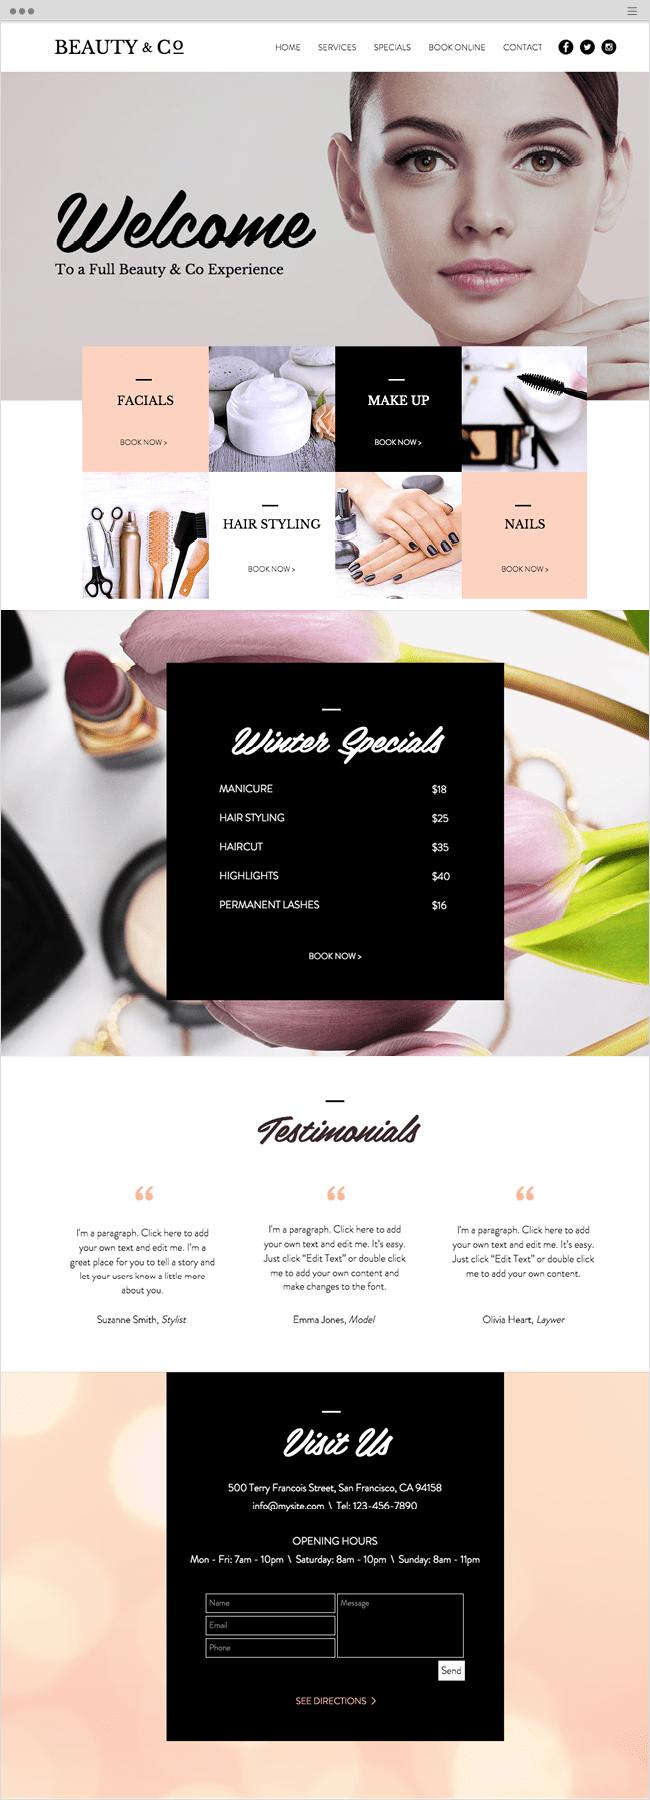 Beauty Salon Wix Website Template